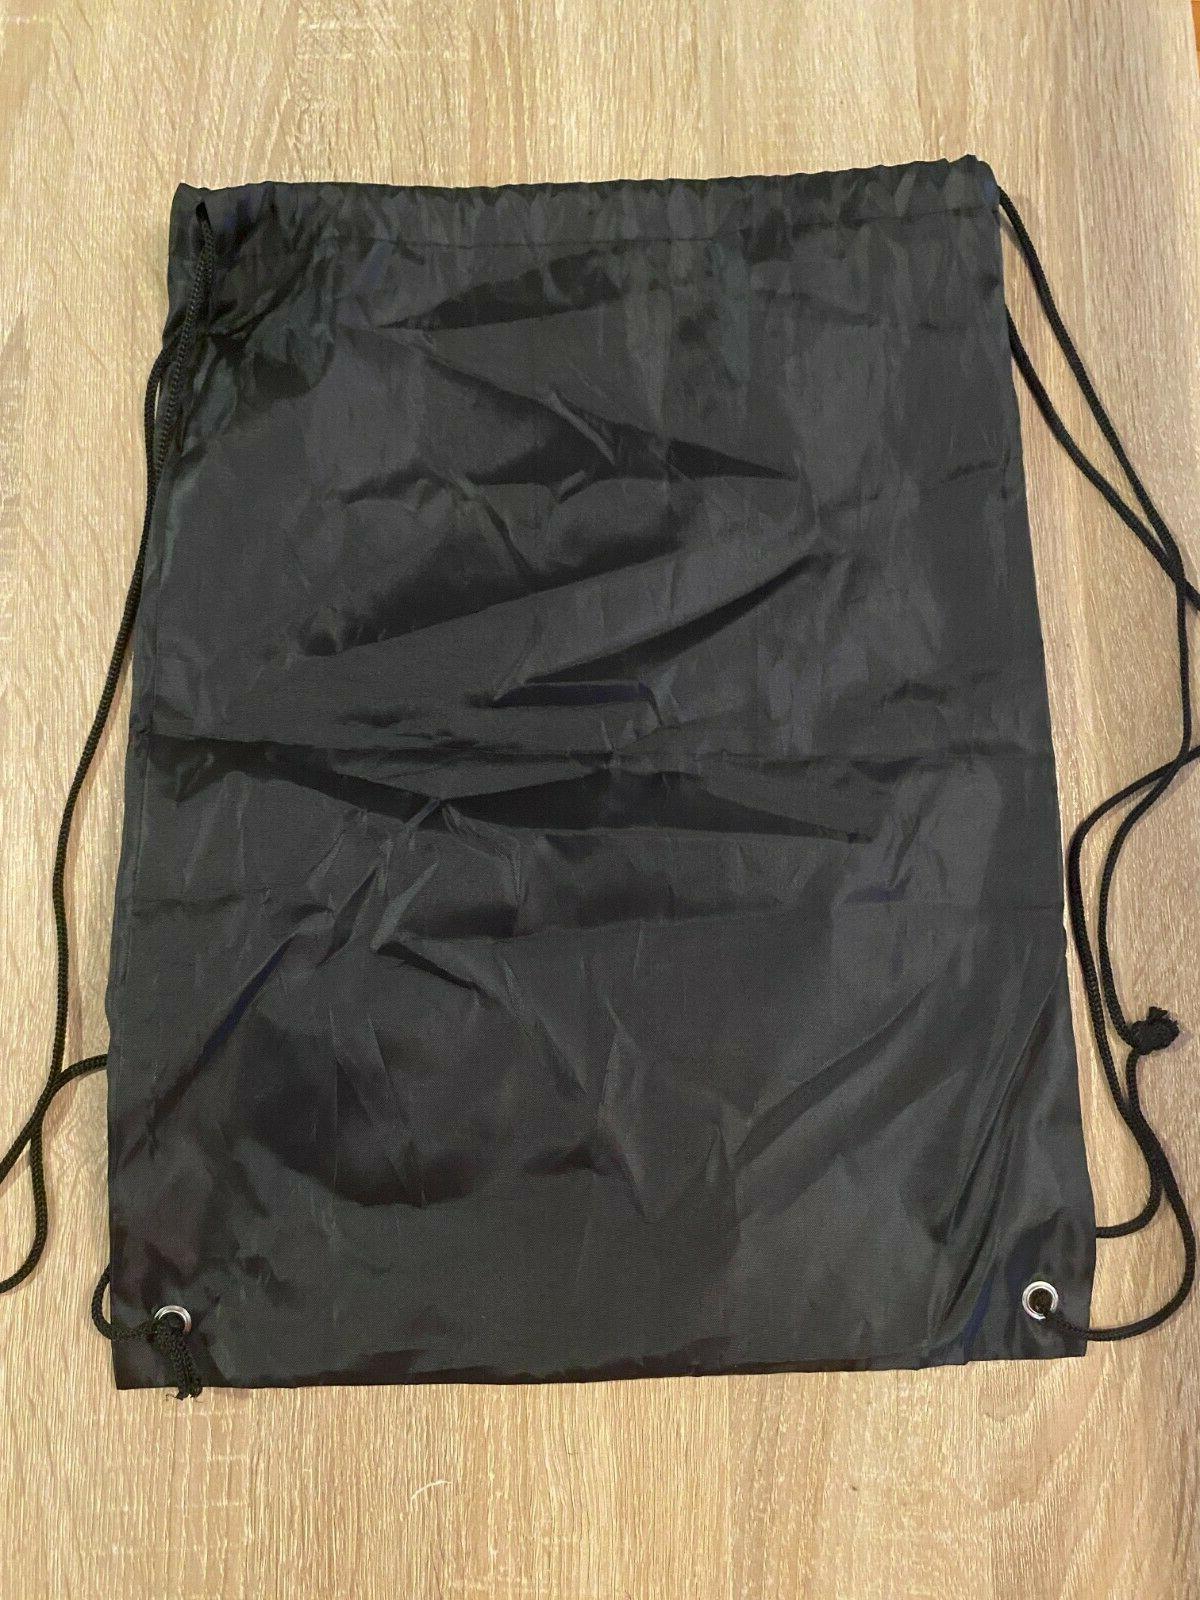 Portland Trail Blazers Drawstring Bag Back Toyota NEW